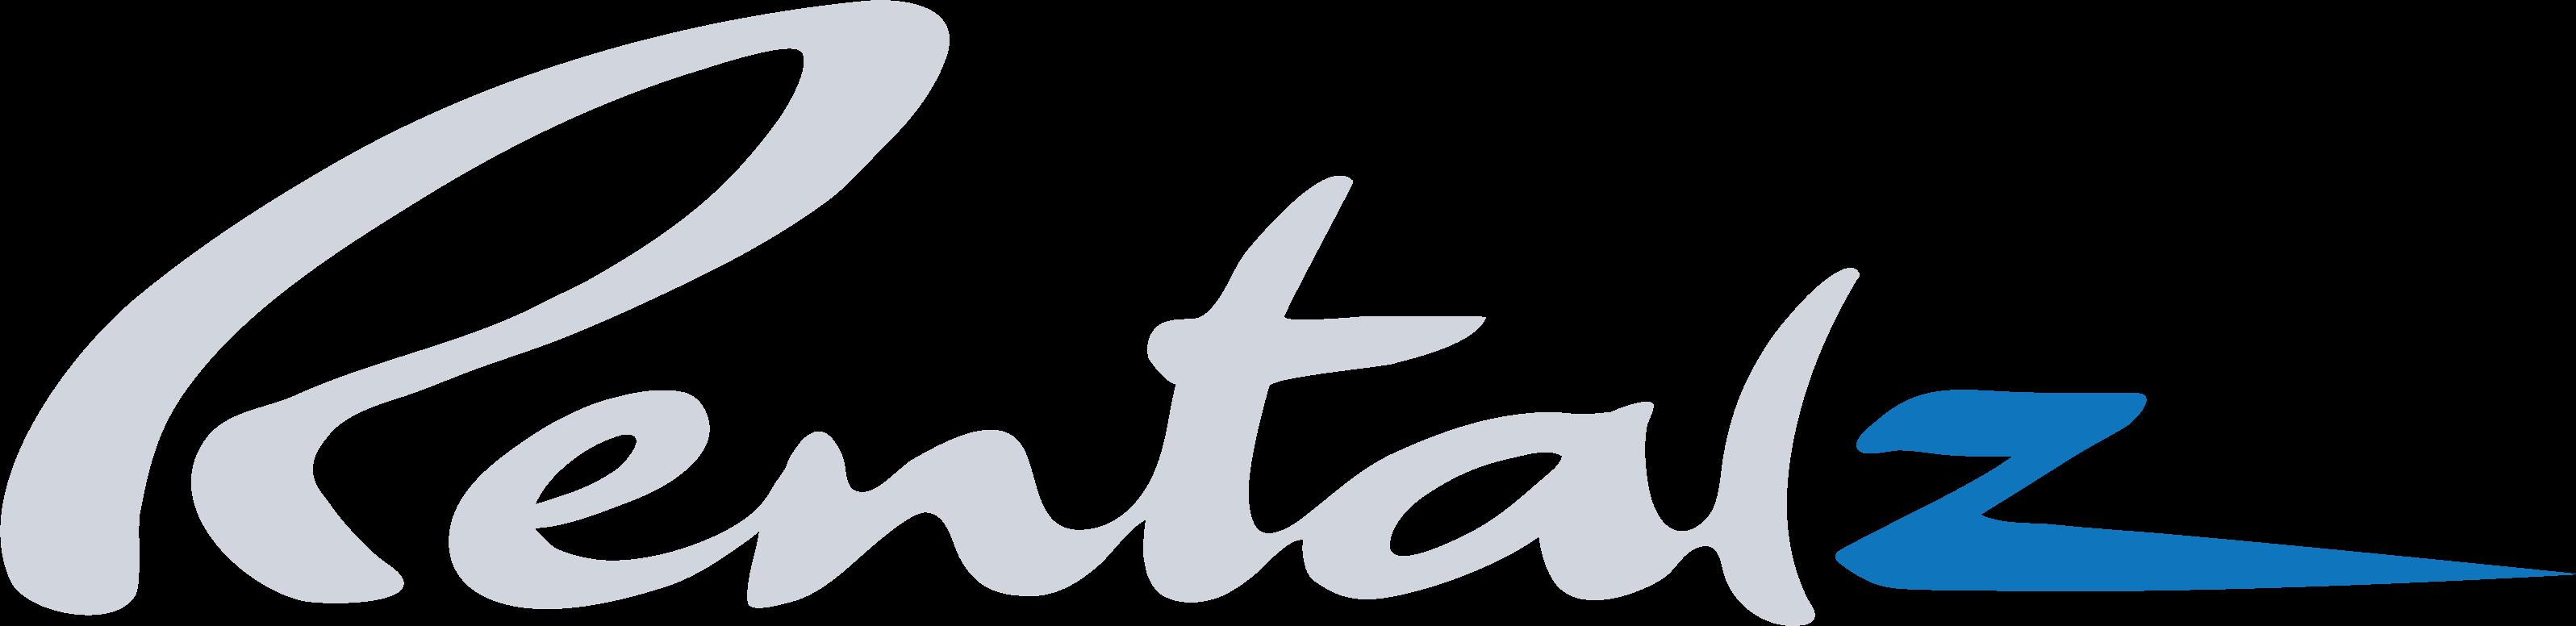 rentalz-logo